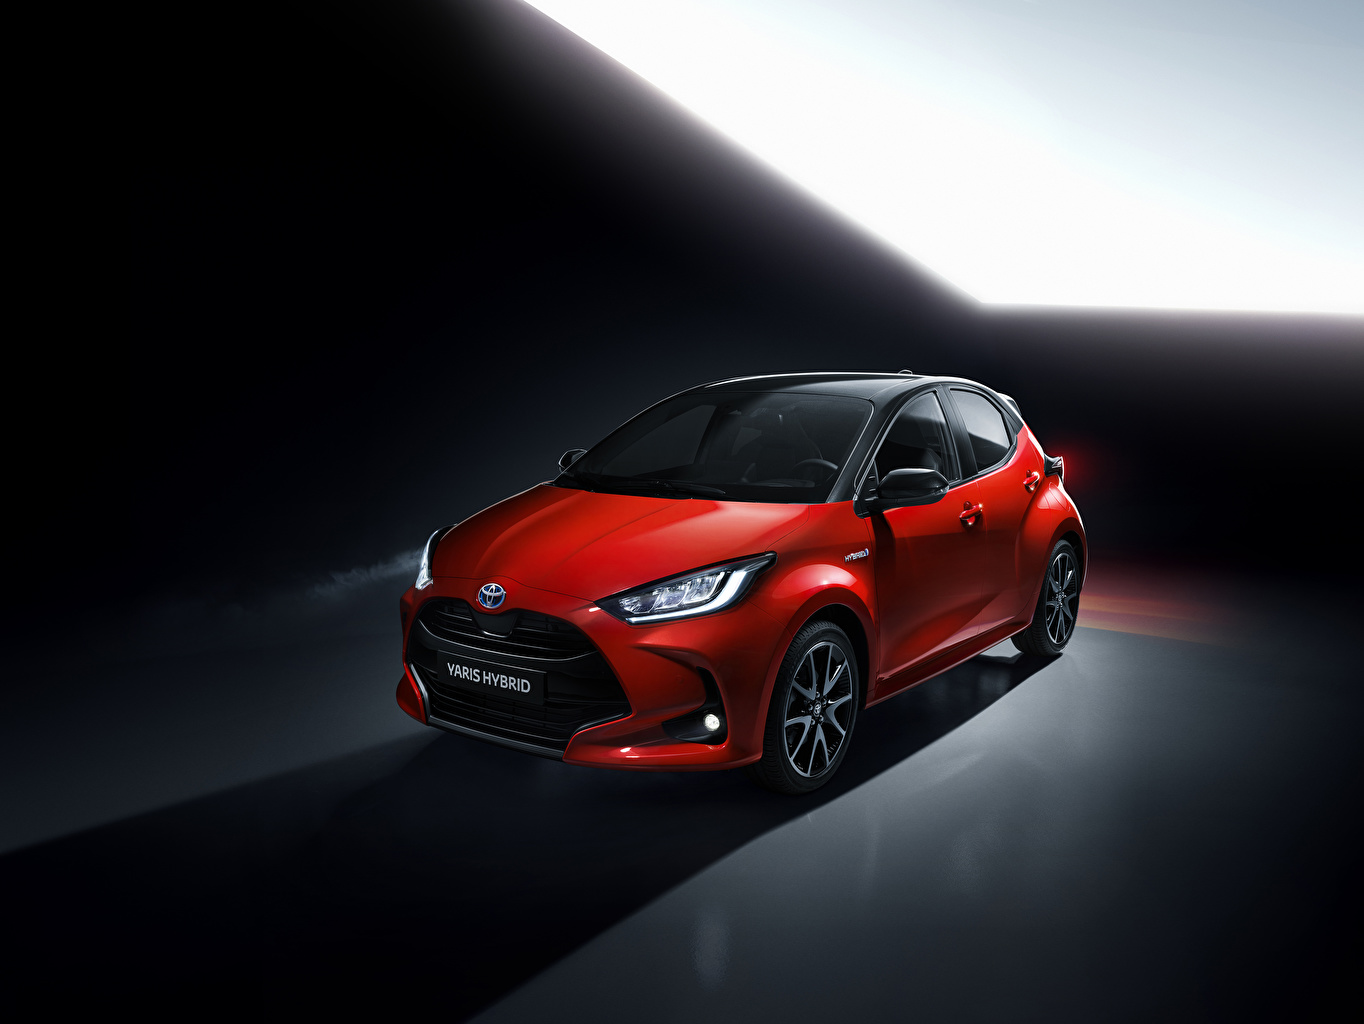 Desktop Hintergrundbilder Toyota 2020 Yaris Hybrid Worldwide Hybrid Autos Rot Autos auto automobil